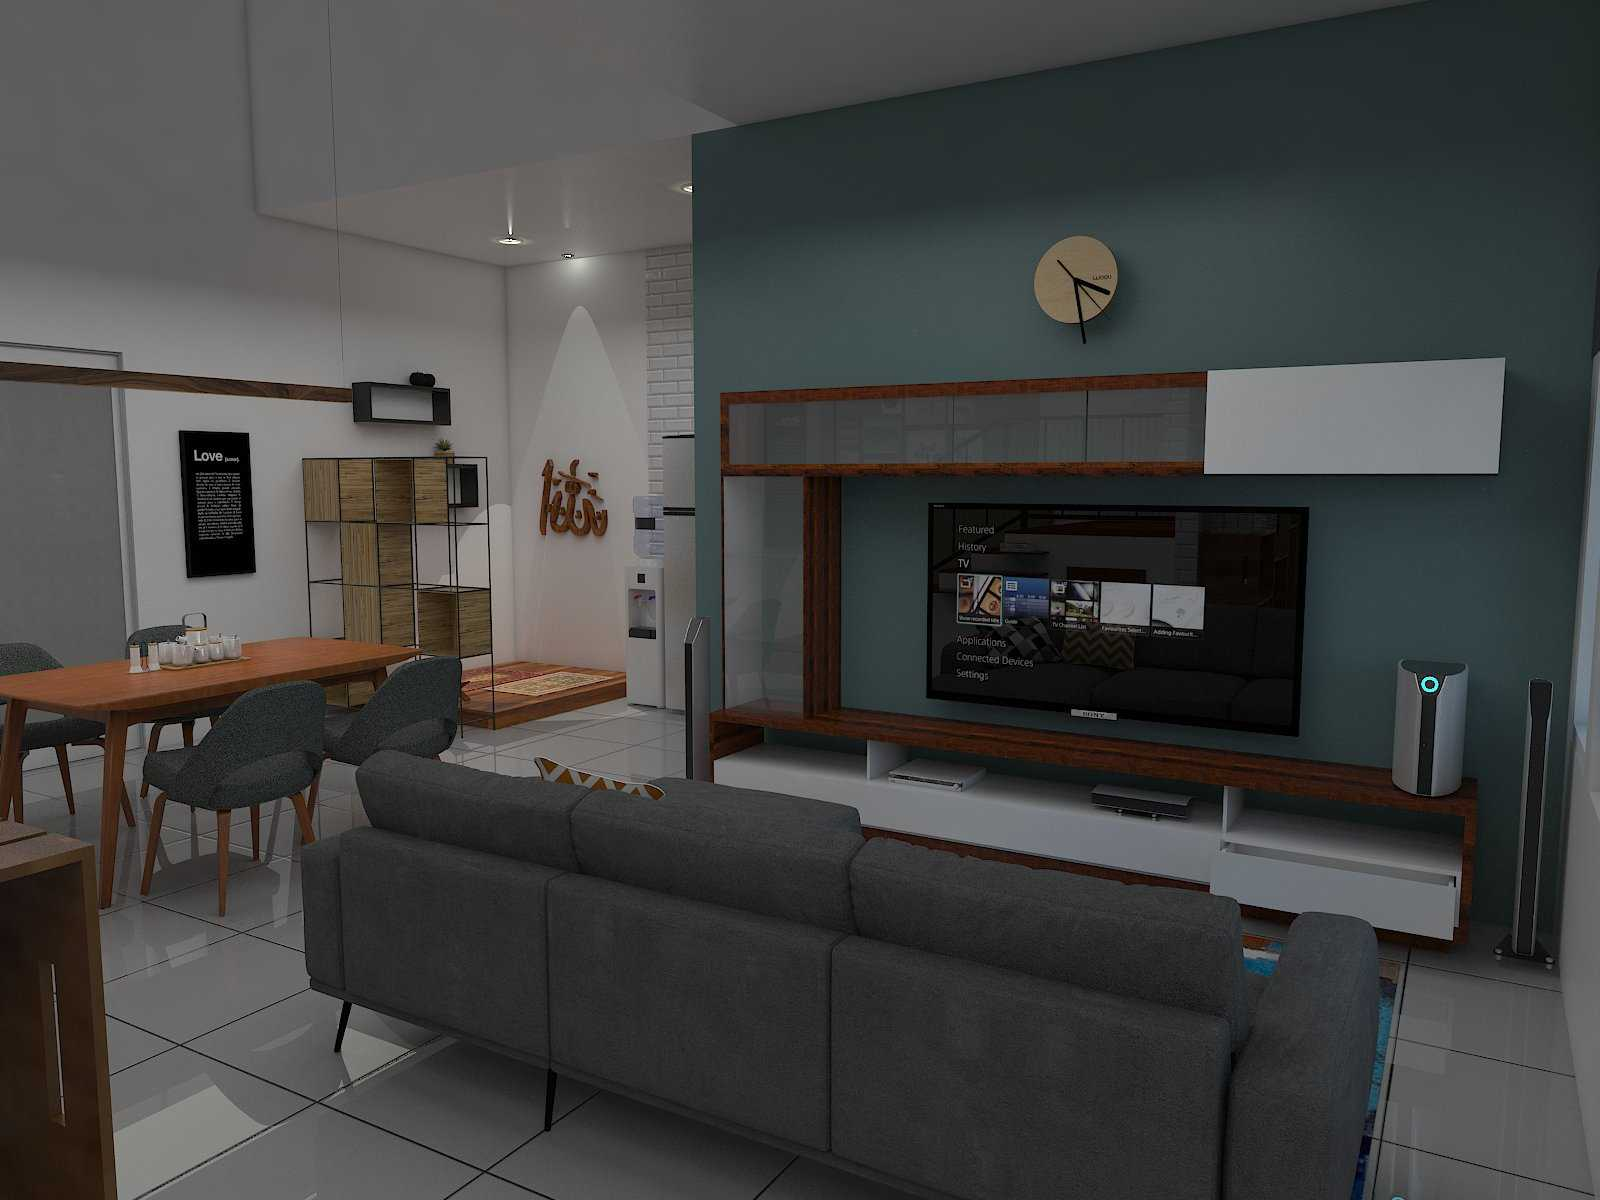 Donnie Marcellino Mr.f's House  Gg. Buntu 2, Jatimelati, Pondokmelati, Kota Bks, Jawa Barat 17415, Indonesia Living Room & Dining Room Design Kontemporer  30162